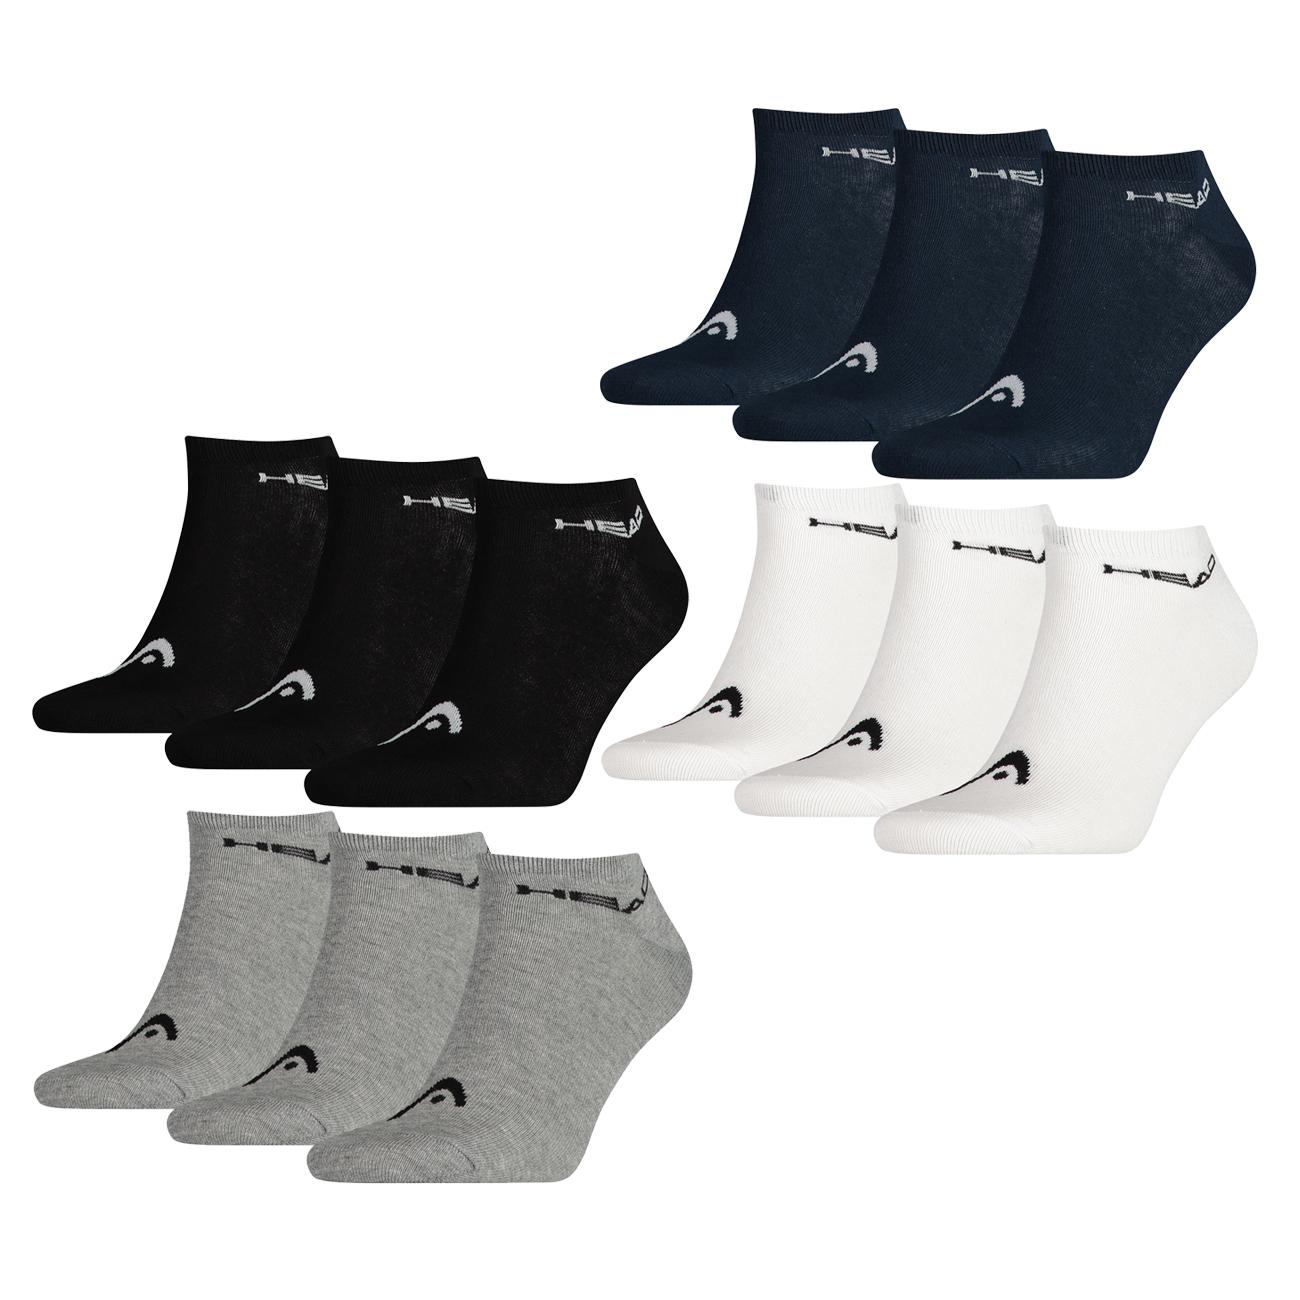 [Mybodywear] 24er Pack HEAD Sneakersocken für 30€ (1,25€ pro Paar) in den Größen 35-46